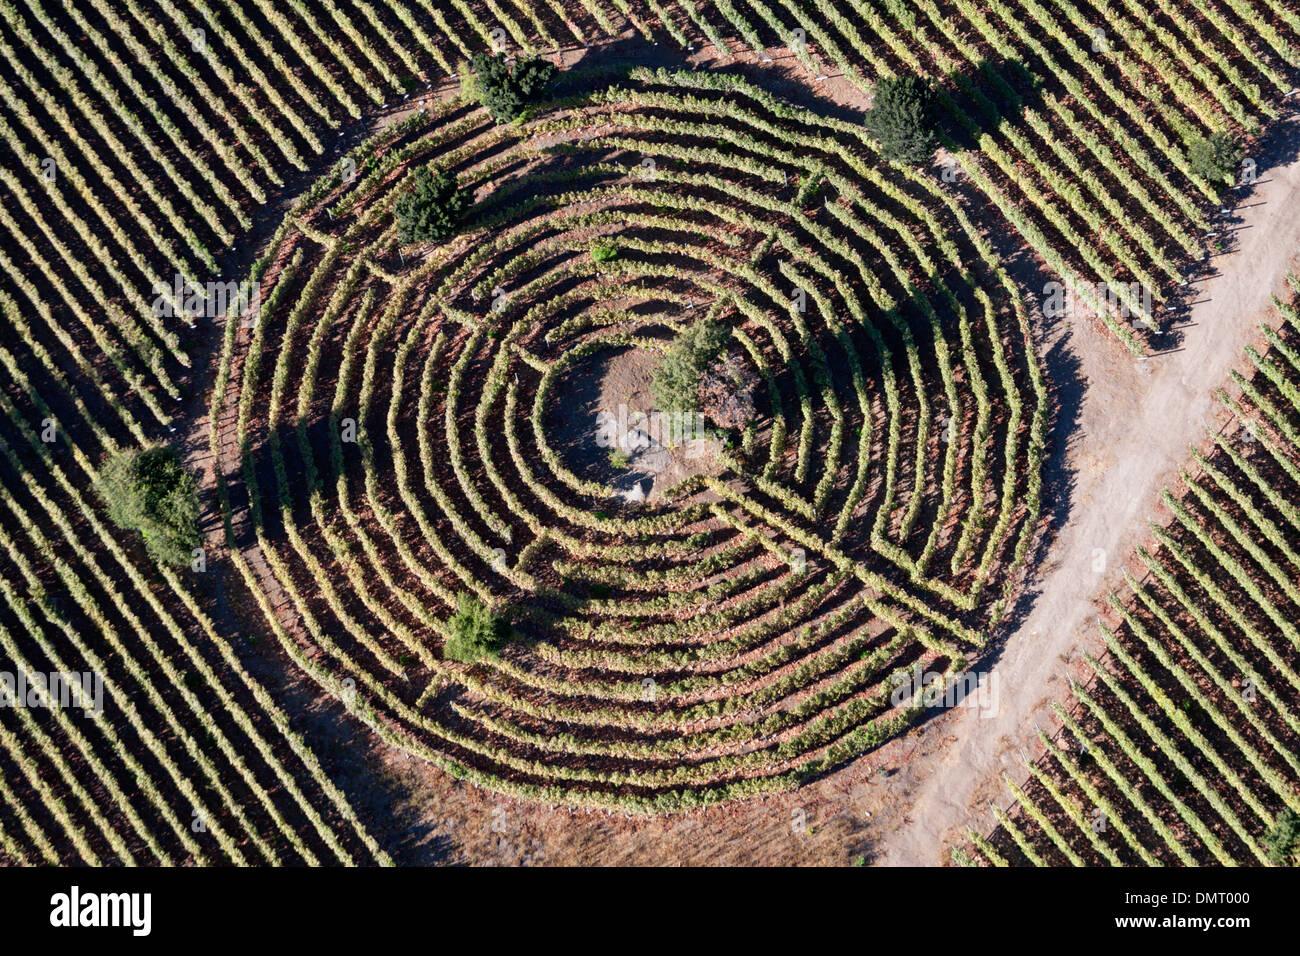 grapes vineyard Chile circle farming wine - Stock Image